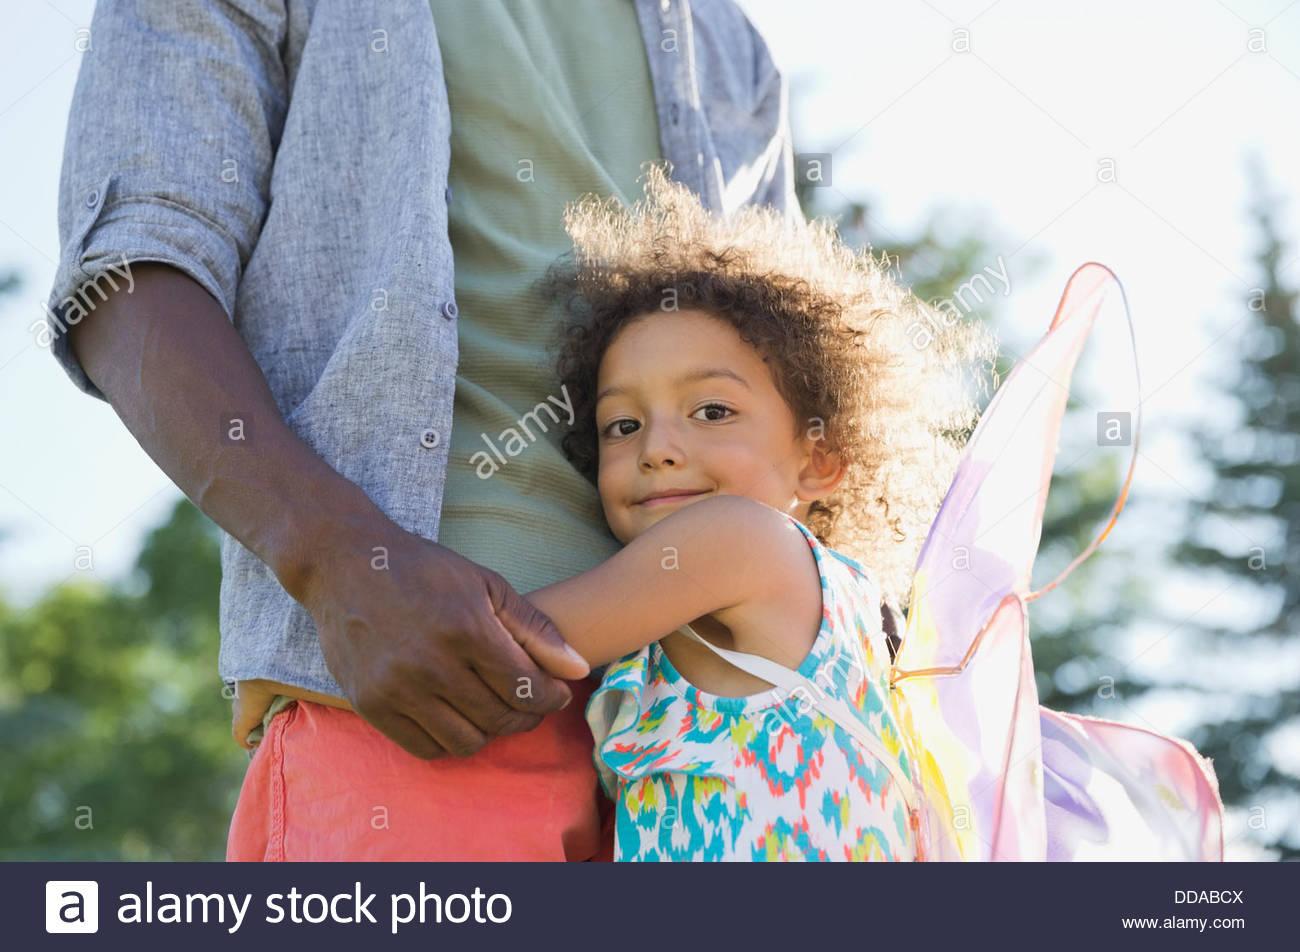 Retrato de linda chica abrazando padre en park Imagen De Stock